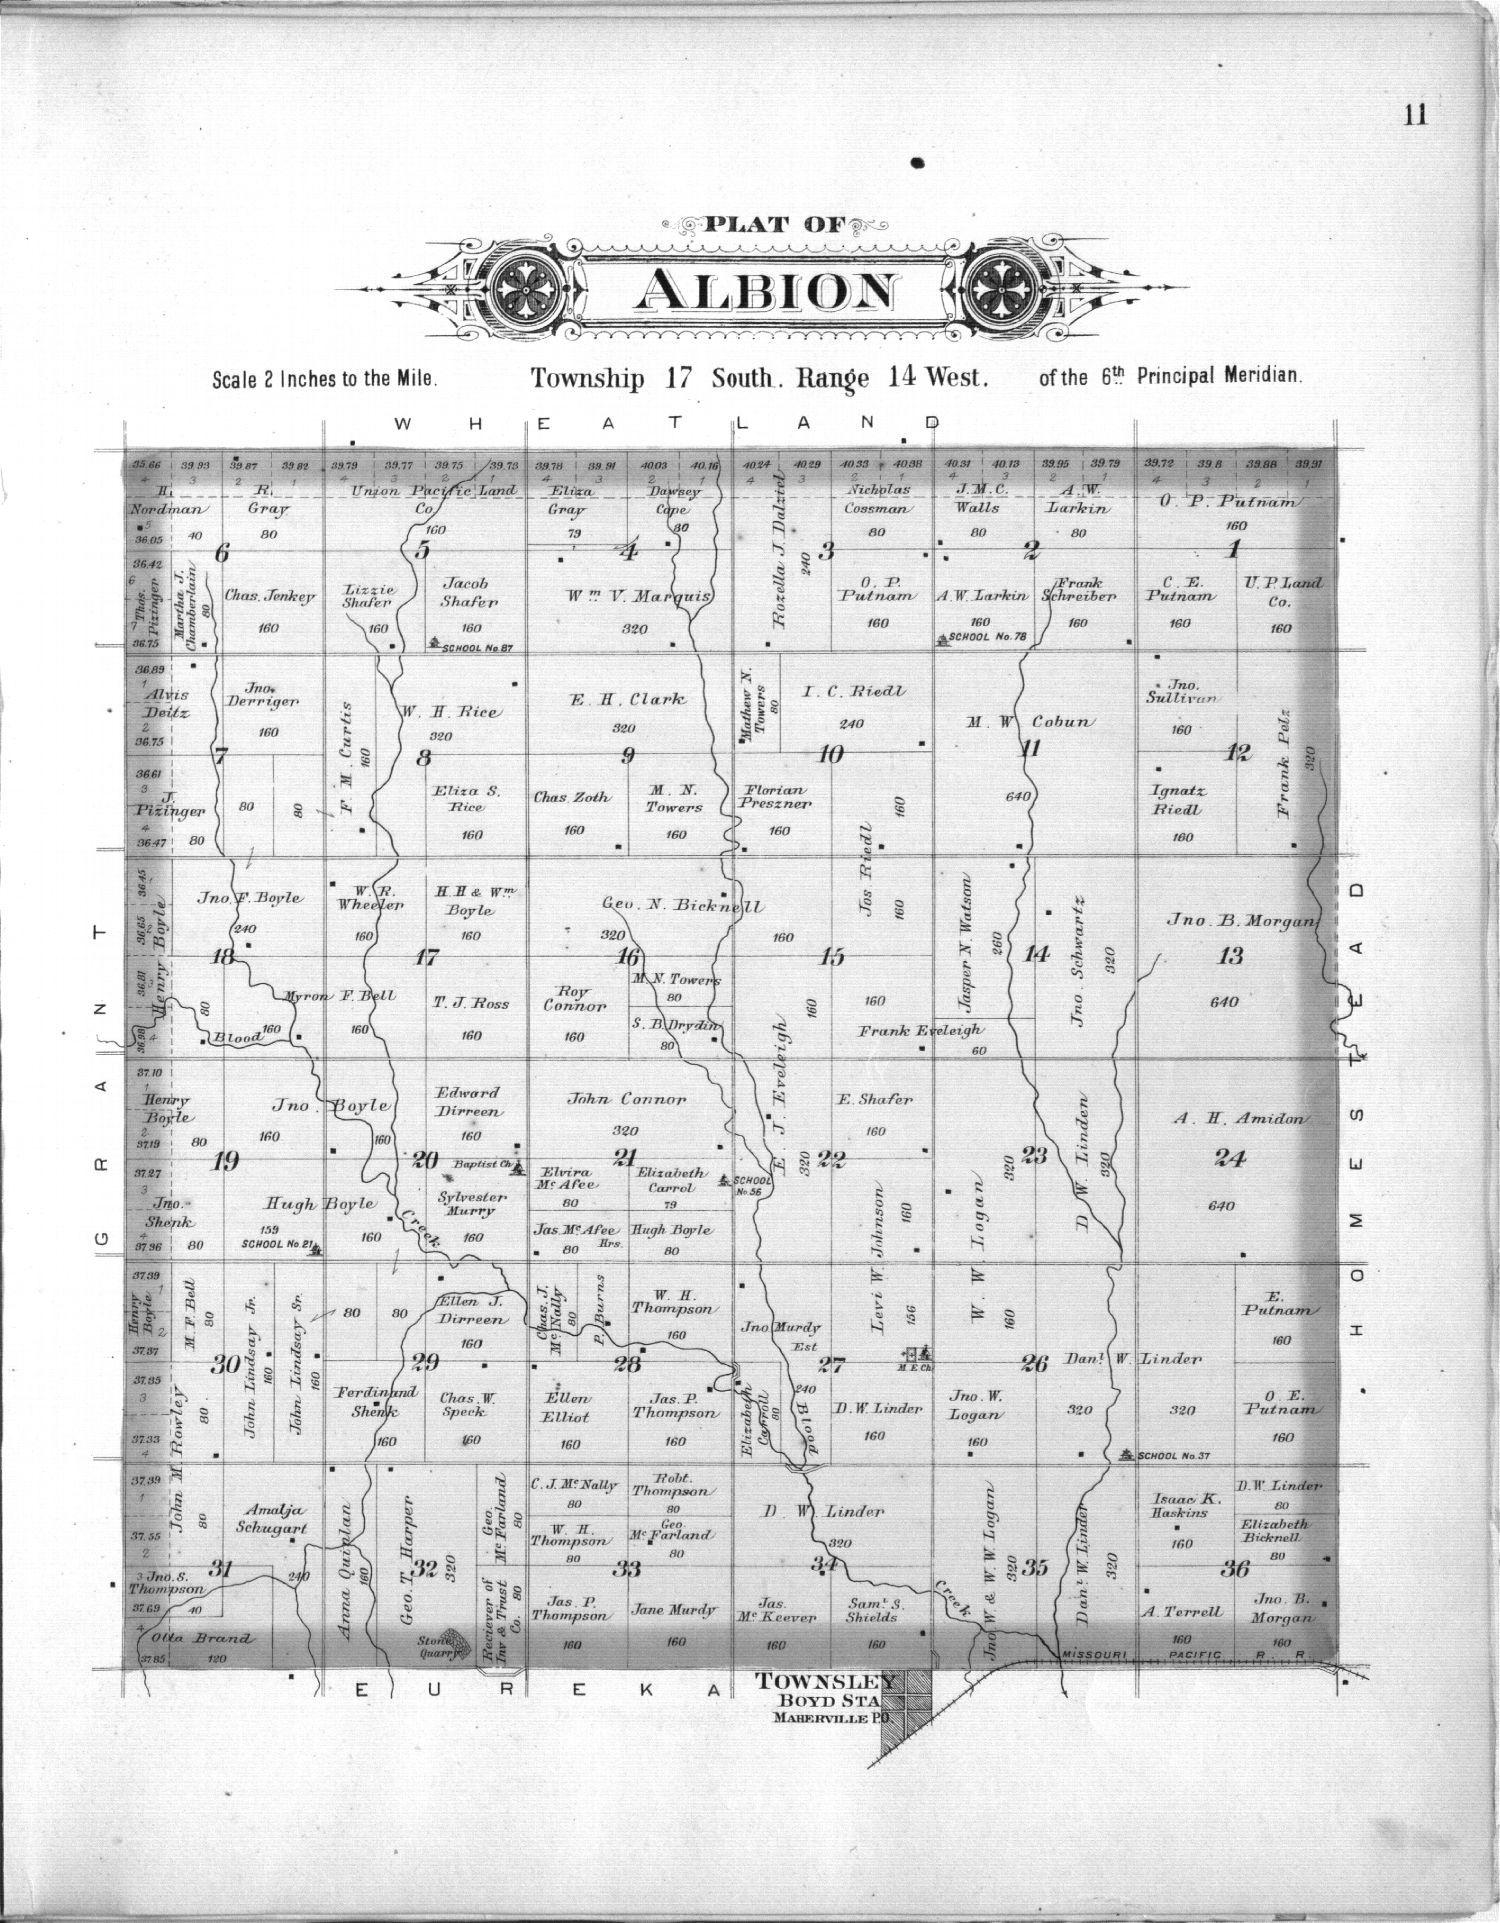 Plat book, Barton County, Kansas - 11